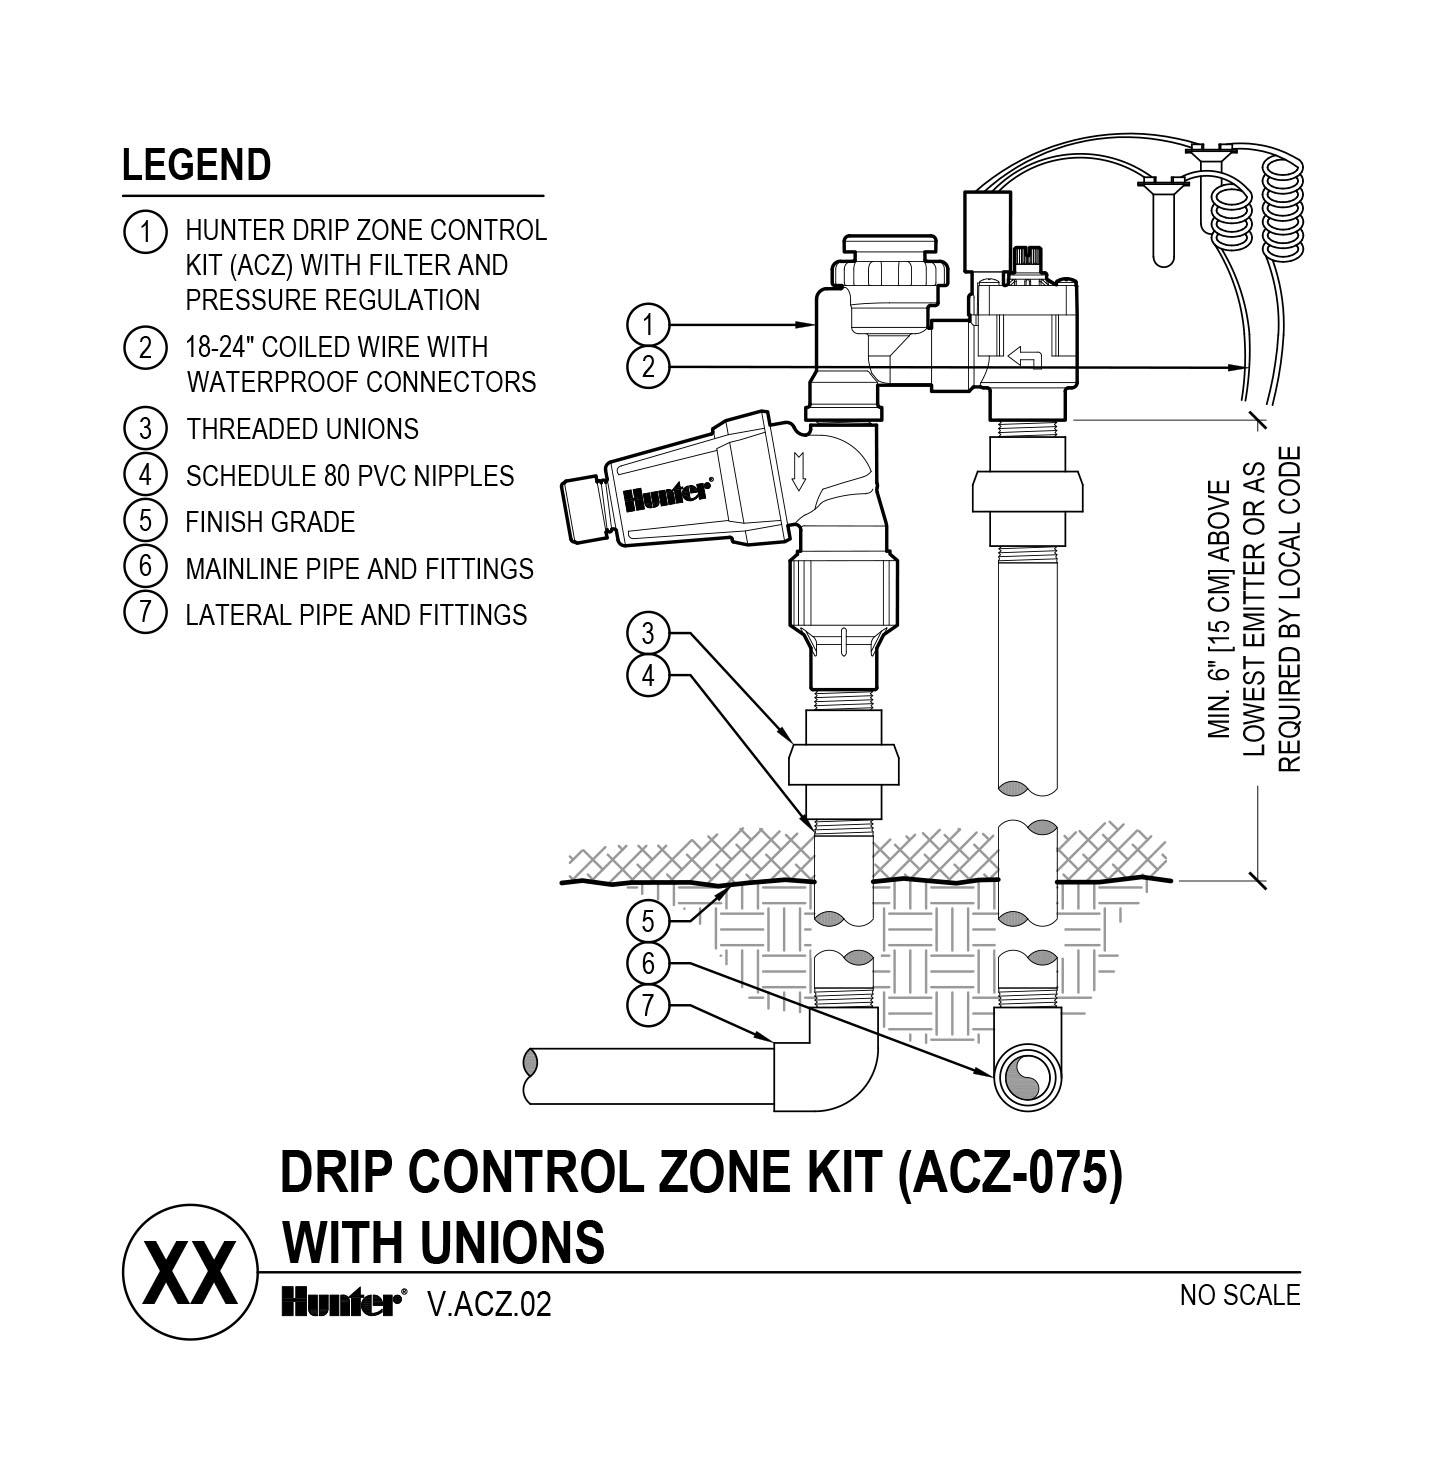 CAD - ACZ-075 with Unions